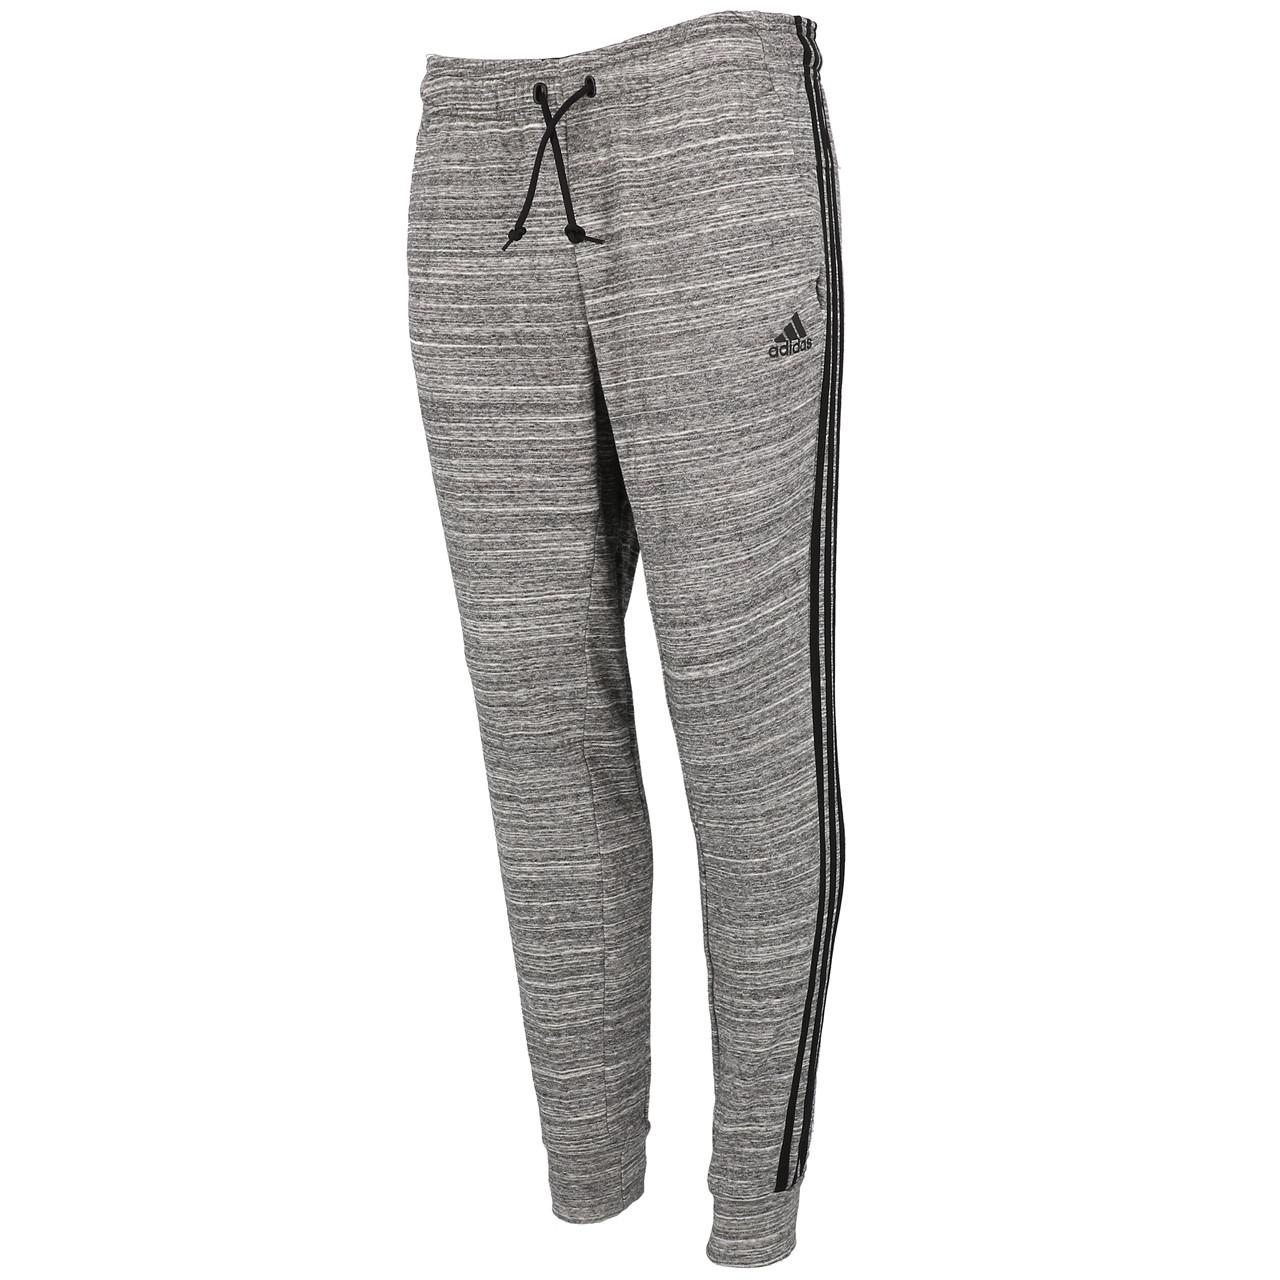 Trainingshose-Adidas-MH-Hth-Hose-Blk-Mel-L-Schwarz-18938-Neu